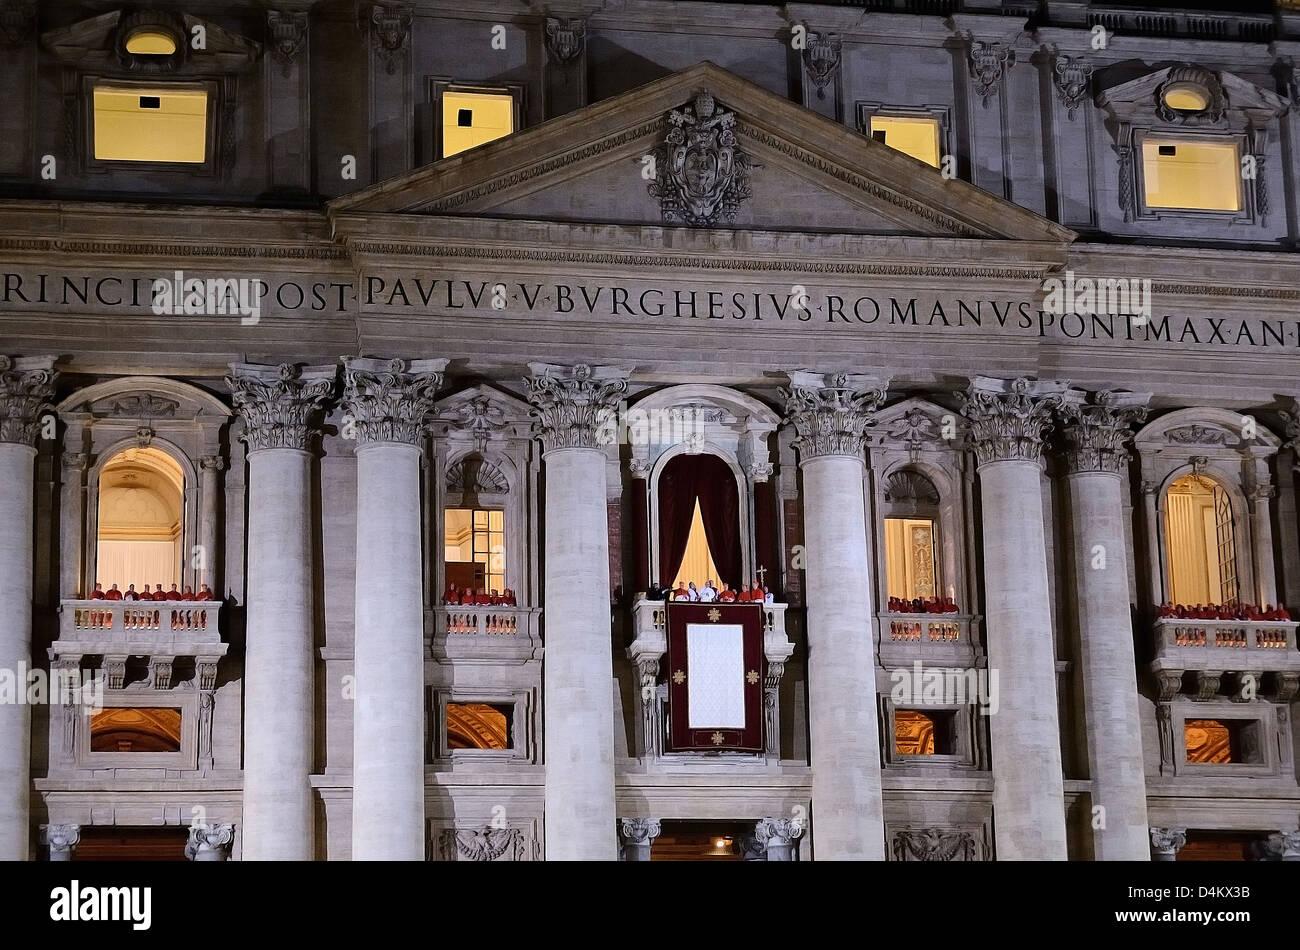 Papa Francesco roms elezione 13.03.2013 San Pietro par Andrea quercioli Photo Stock